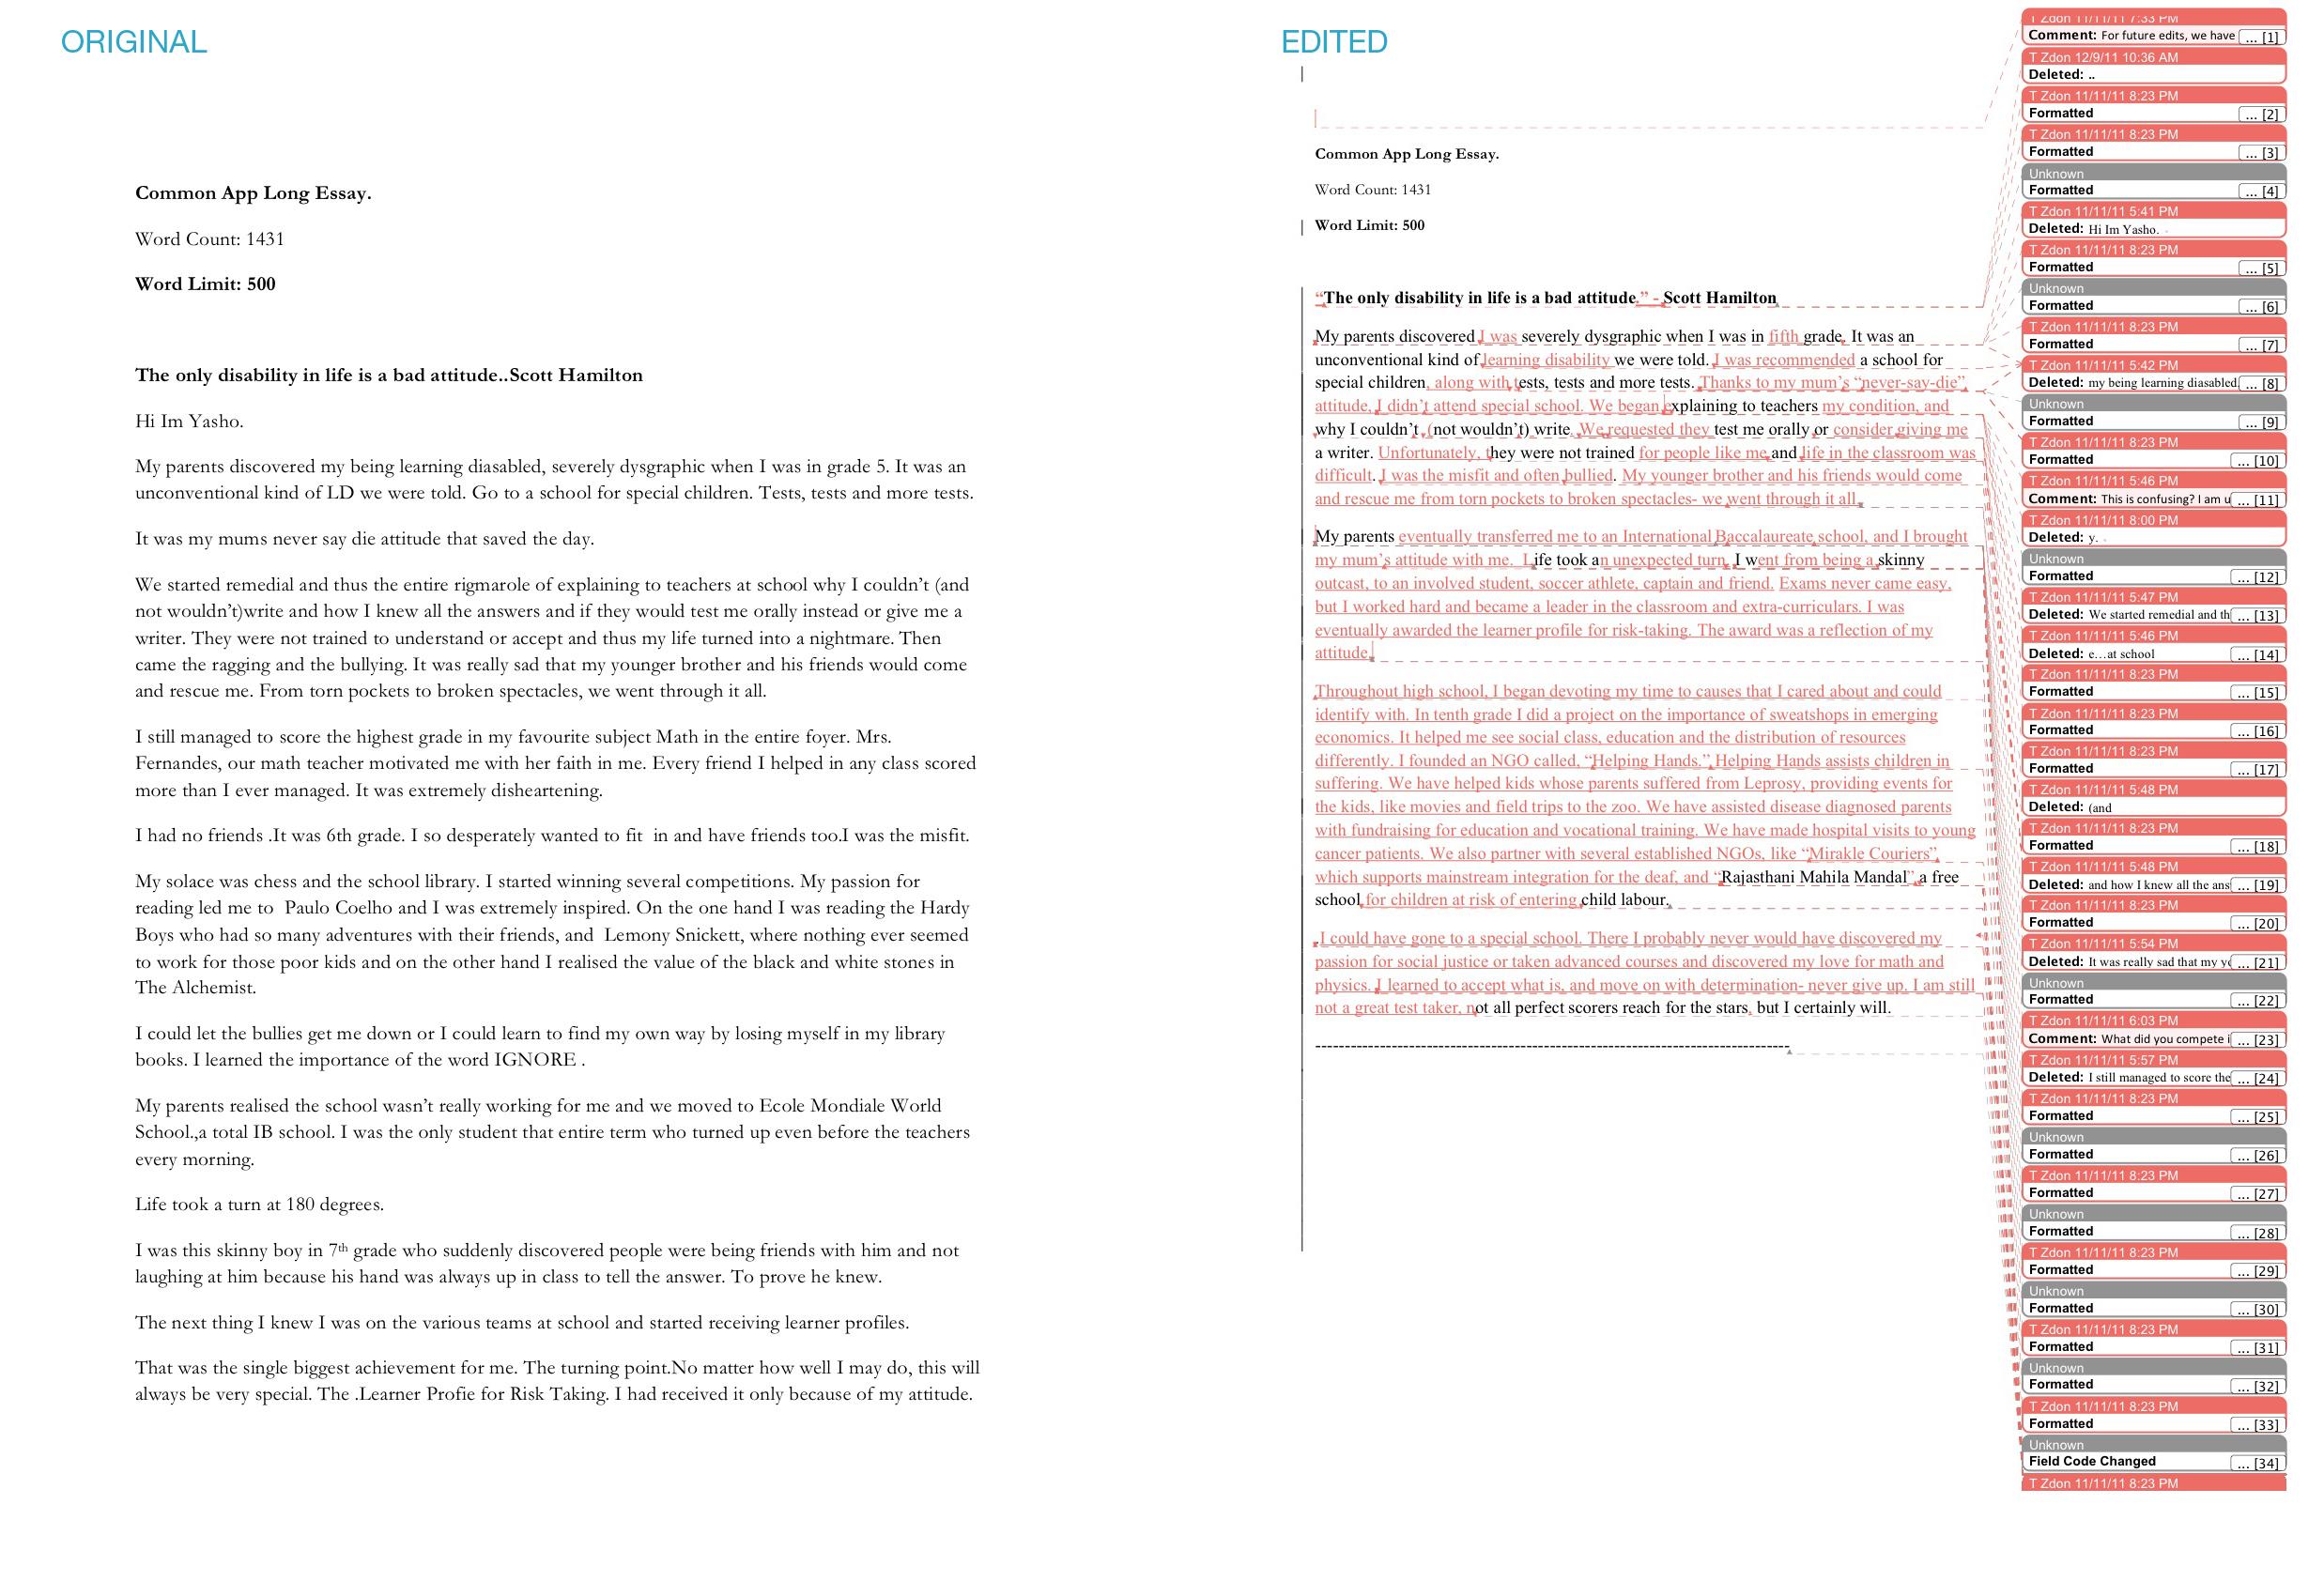 011 Vmca6ux3d2 How Many Common App Essays Do You Write Essay Amazing Should Full